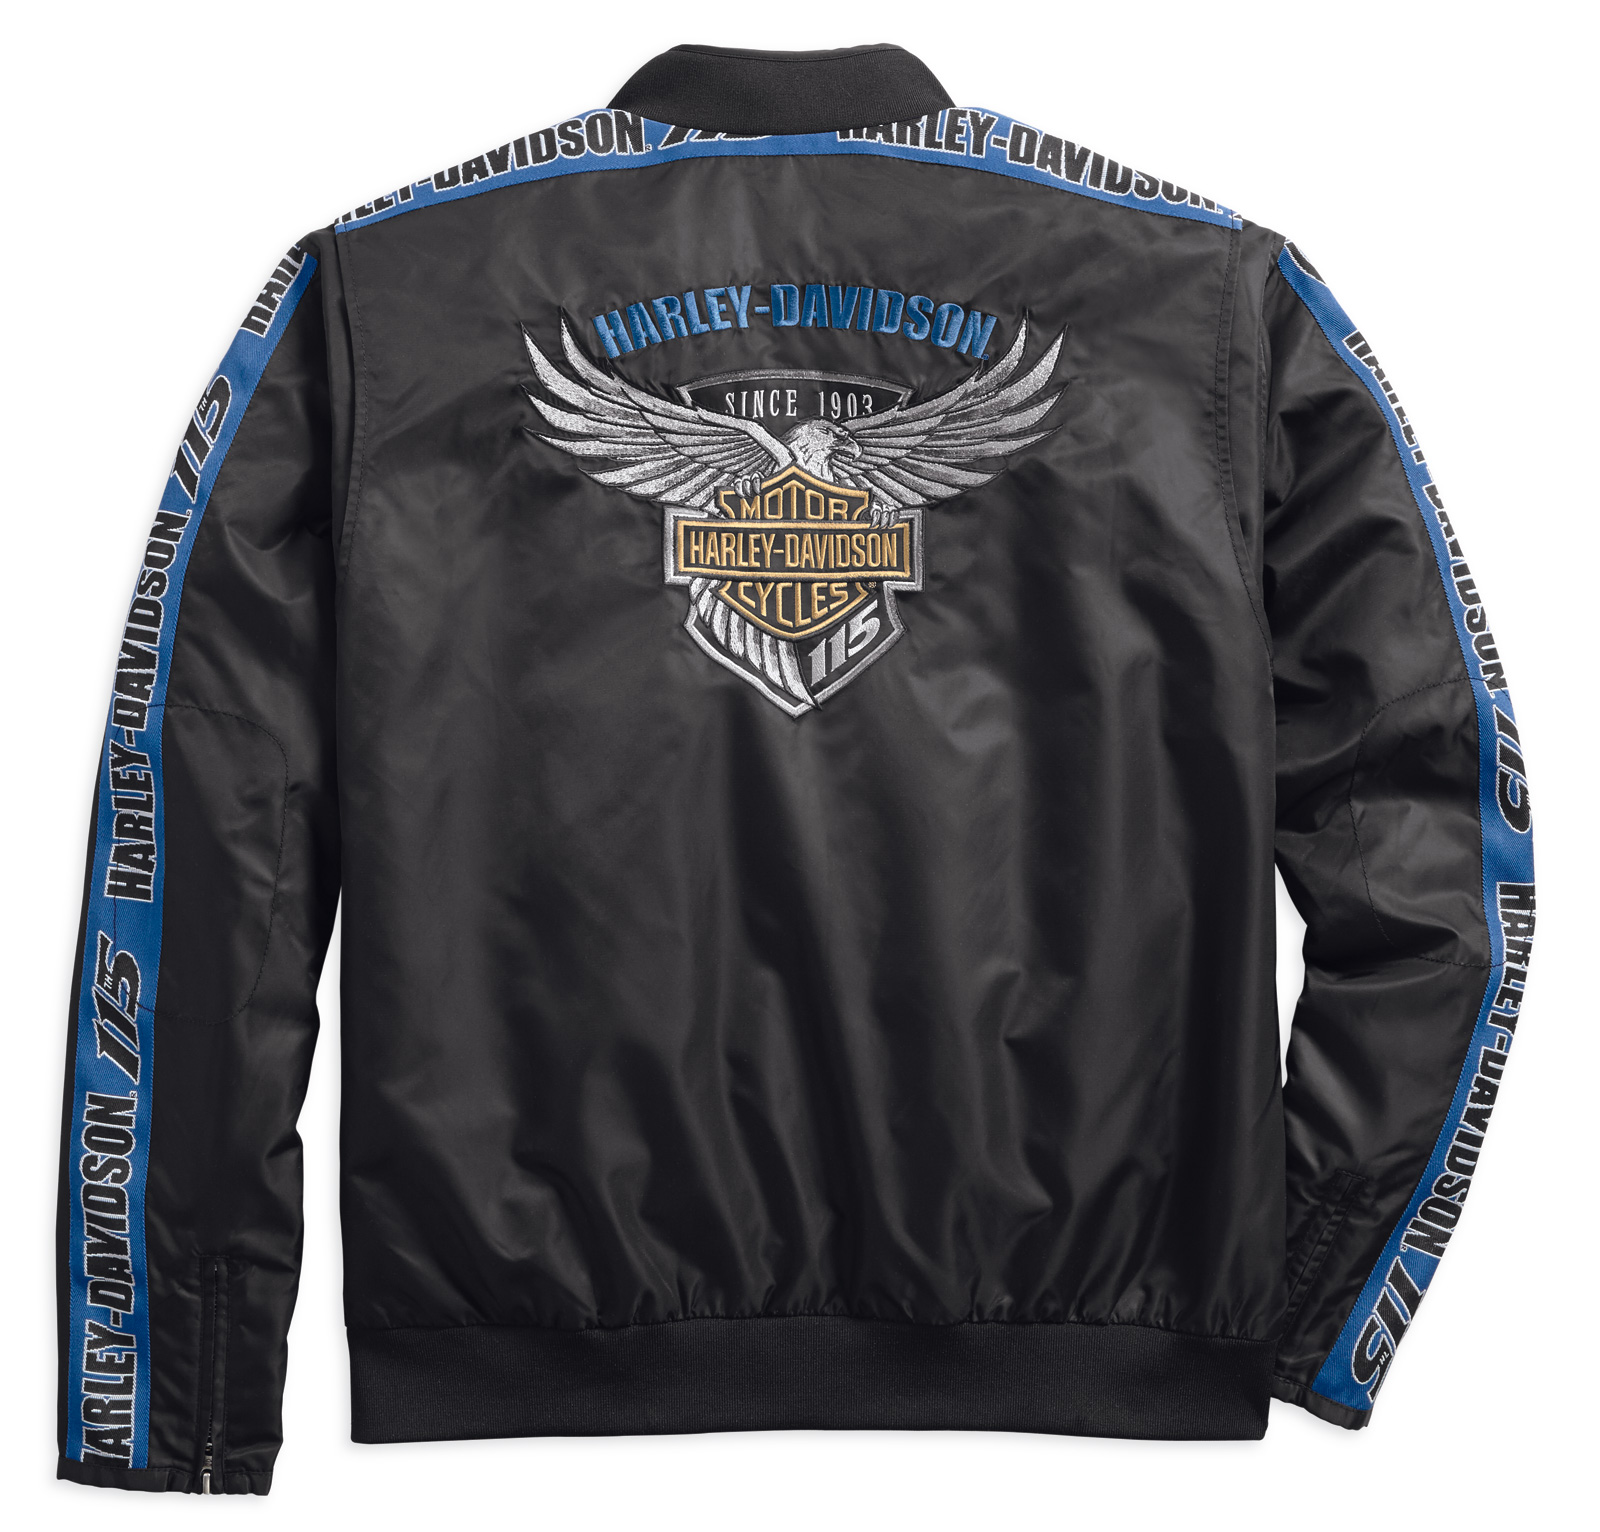 Harley jacke 115 anniversary